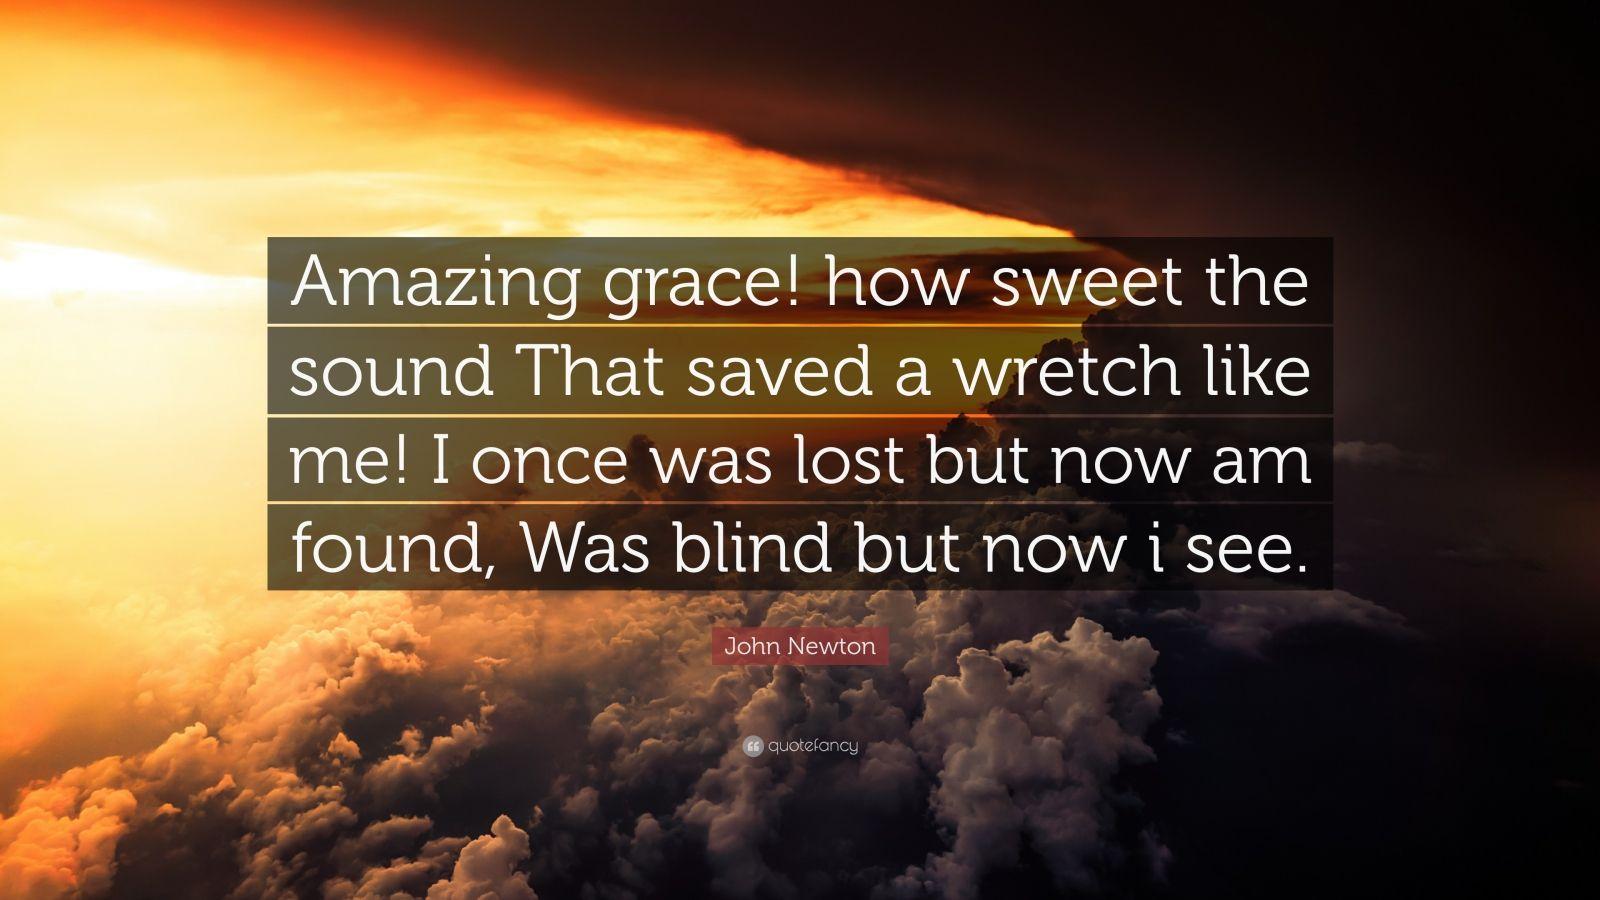 john newton quote �amazing grace how sweet the sound